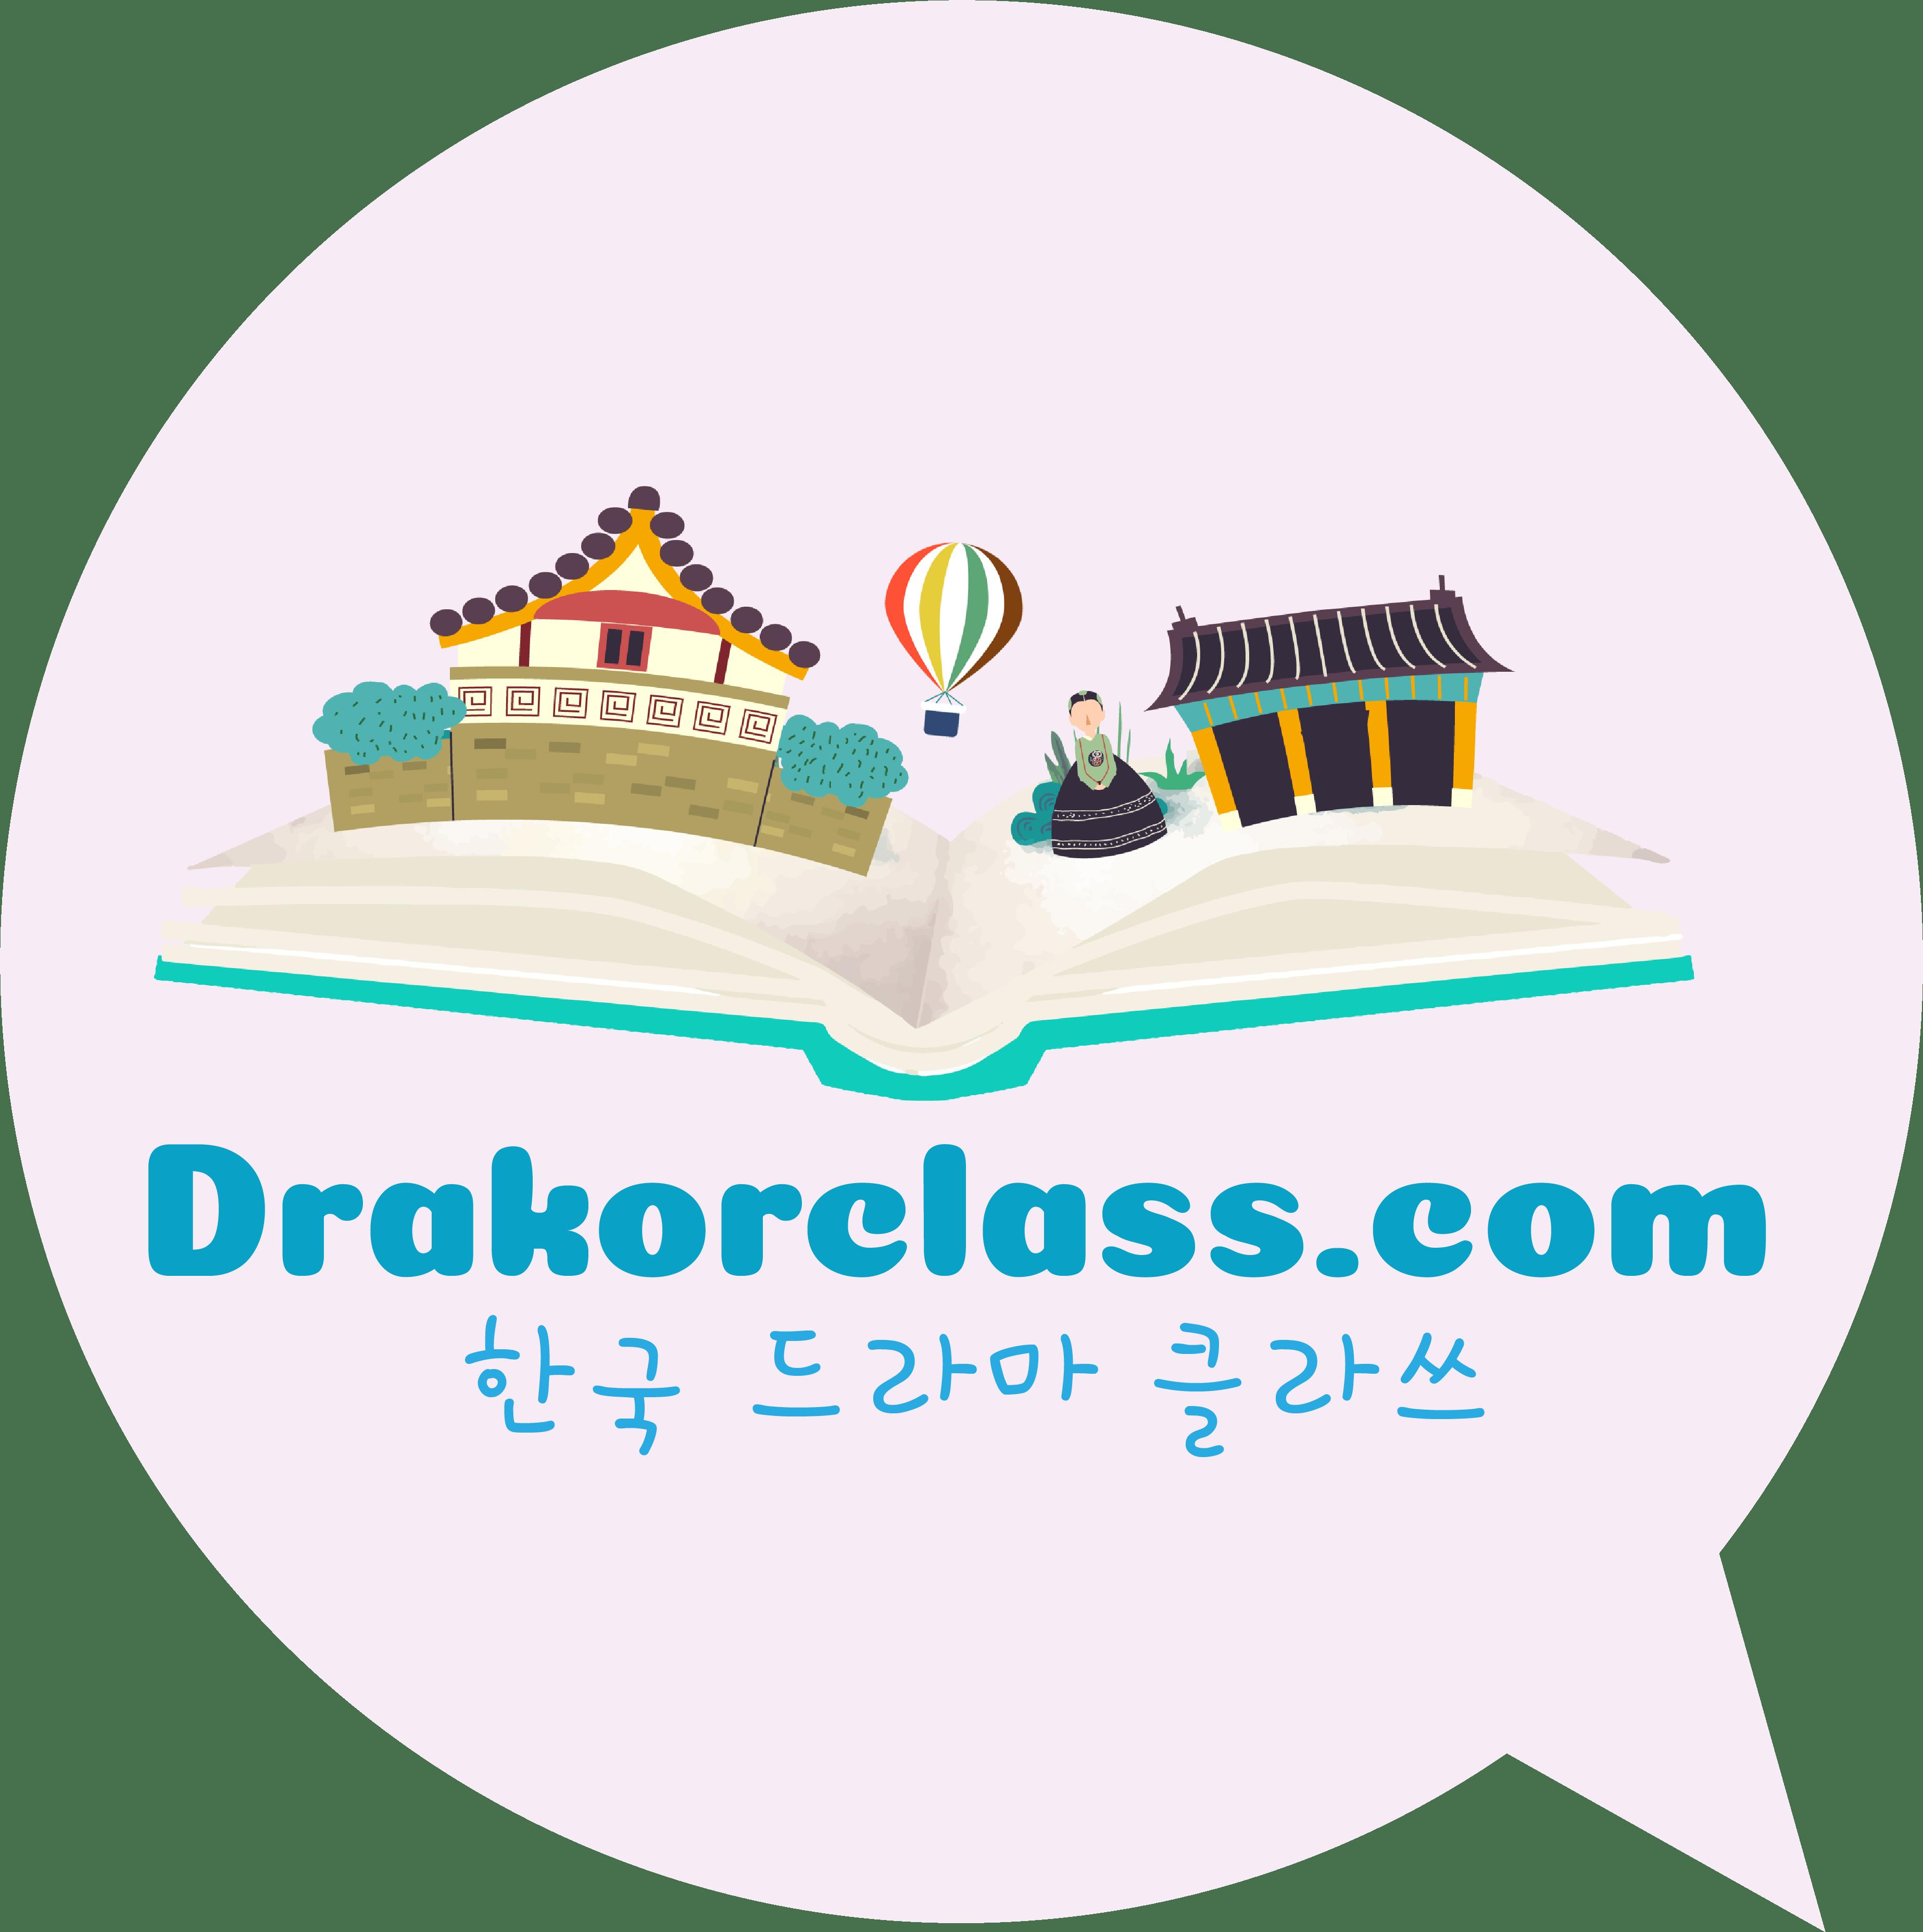 Logo Drakor Class